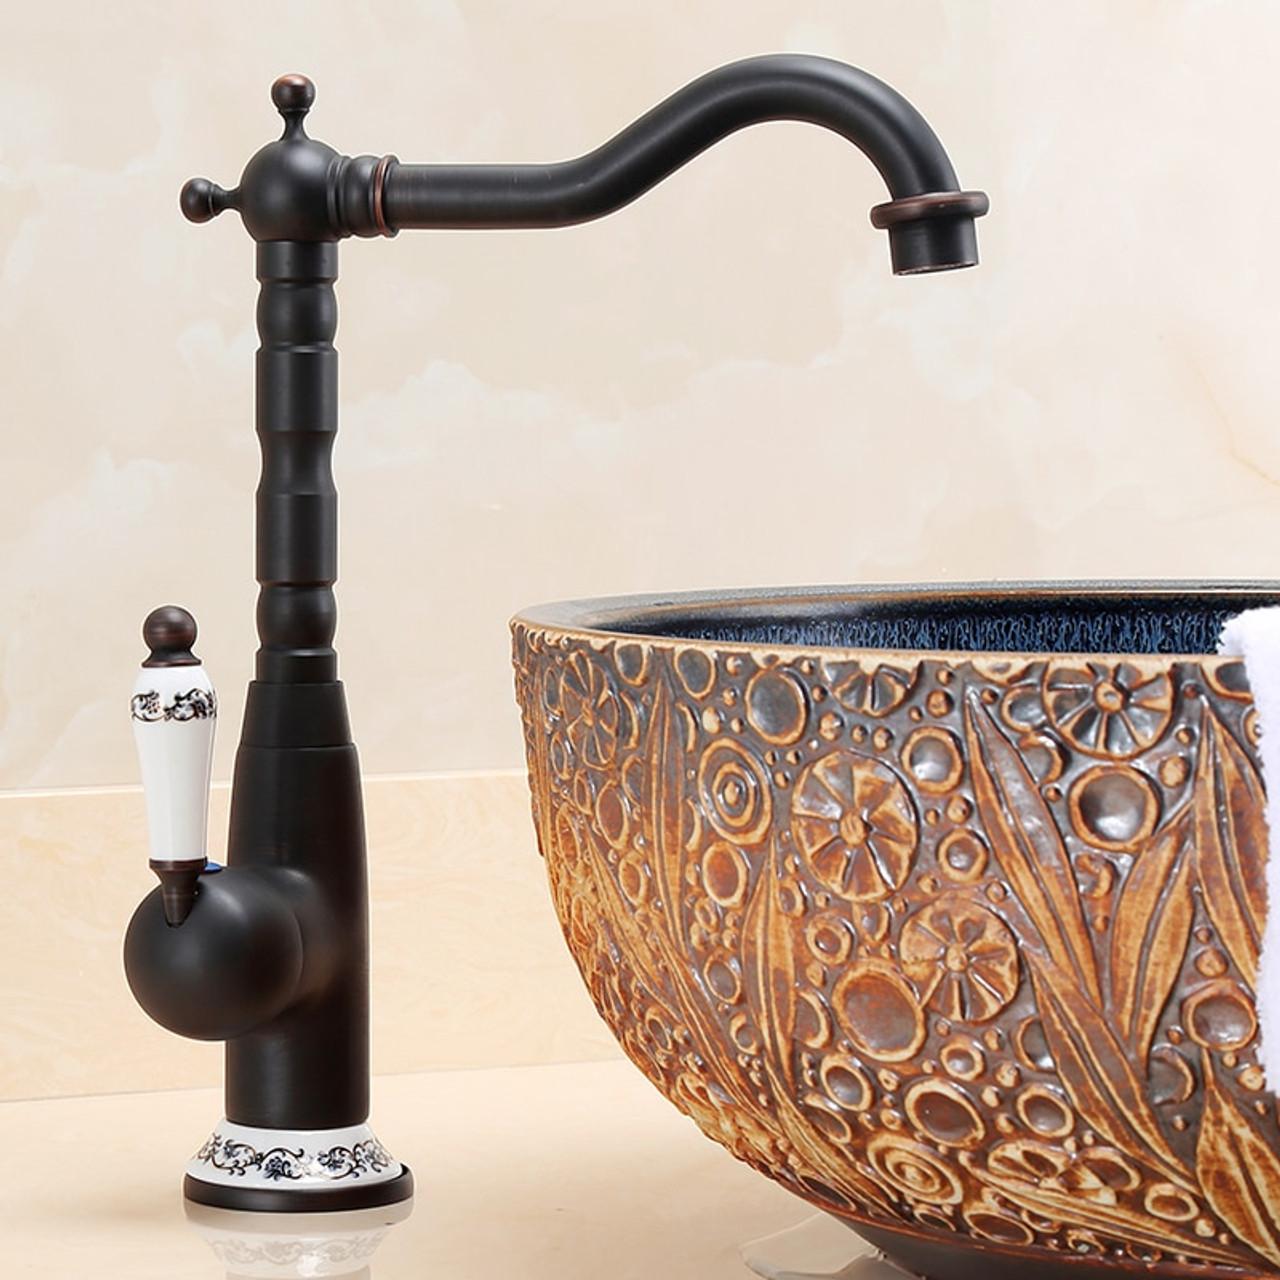 Picture of: Kitchen Faucets 360 Swivel Antique Brass Porcelain Mixer Tap Bathroom Basin Mixer Hot Cold Tap Antique Faucet Onshopdeals Com